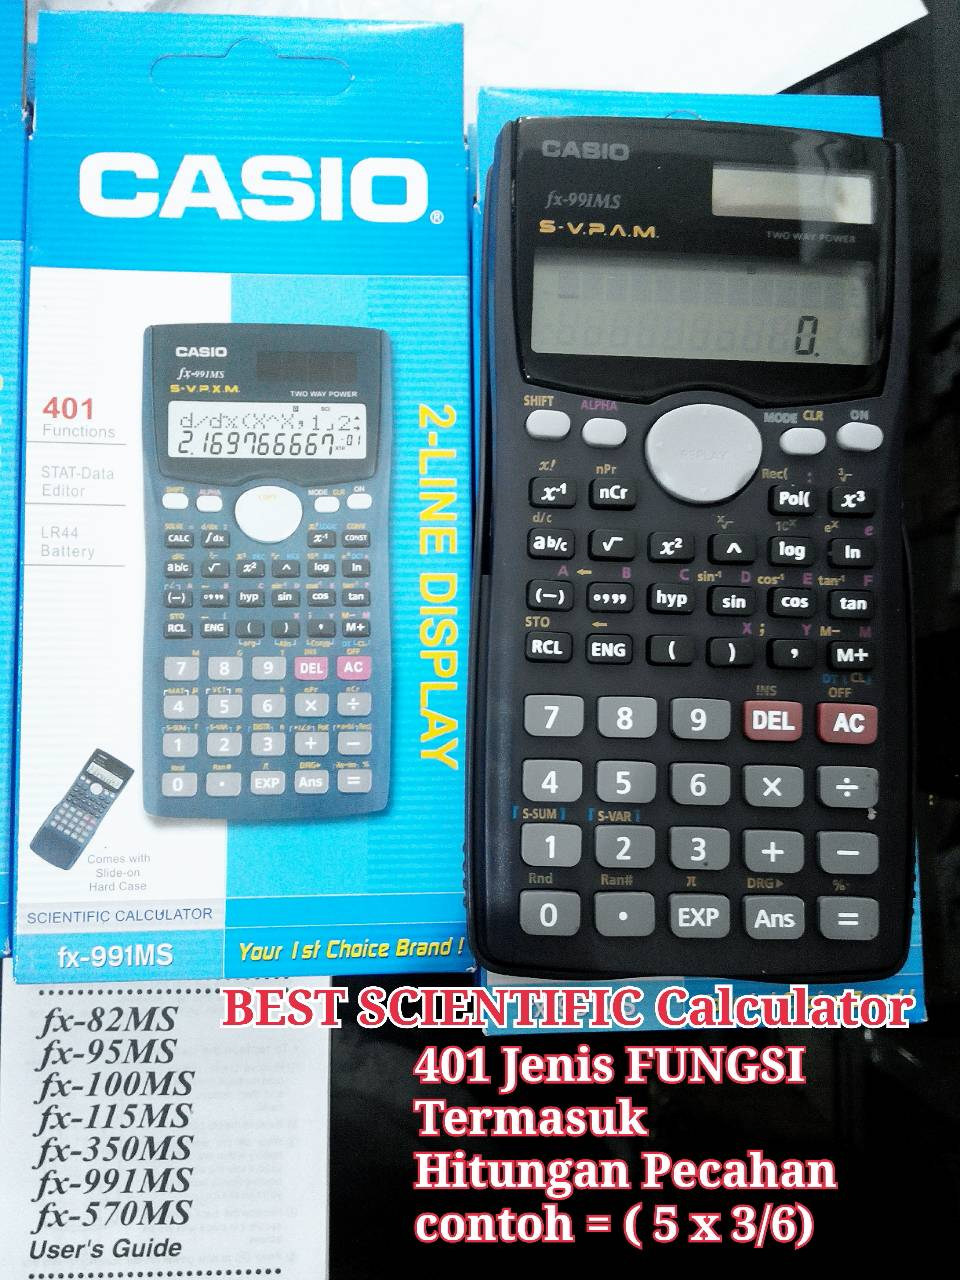 Jual Scientific Calculator Fx991 Ms 401 Macam Fungsi Pusat Kalkulator Hitung Distributor Tokopedia